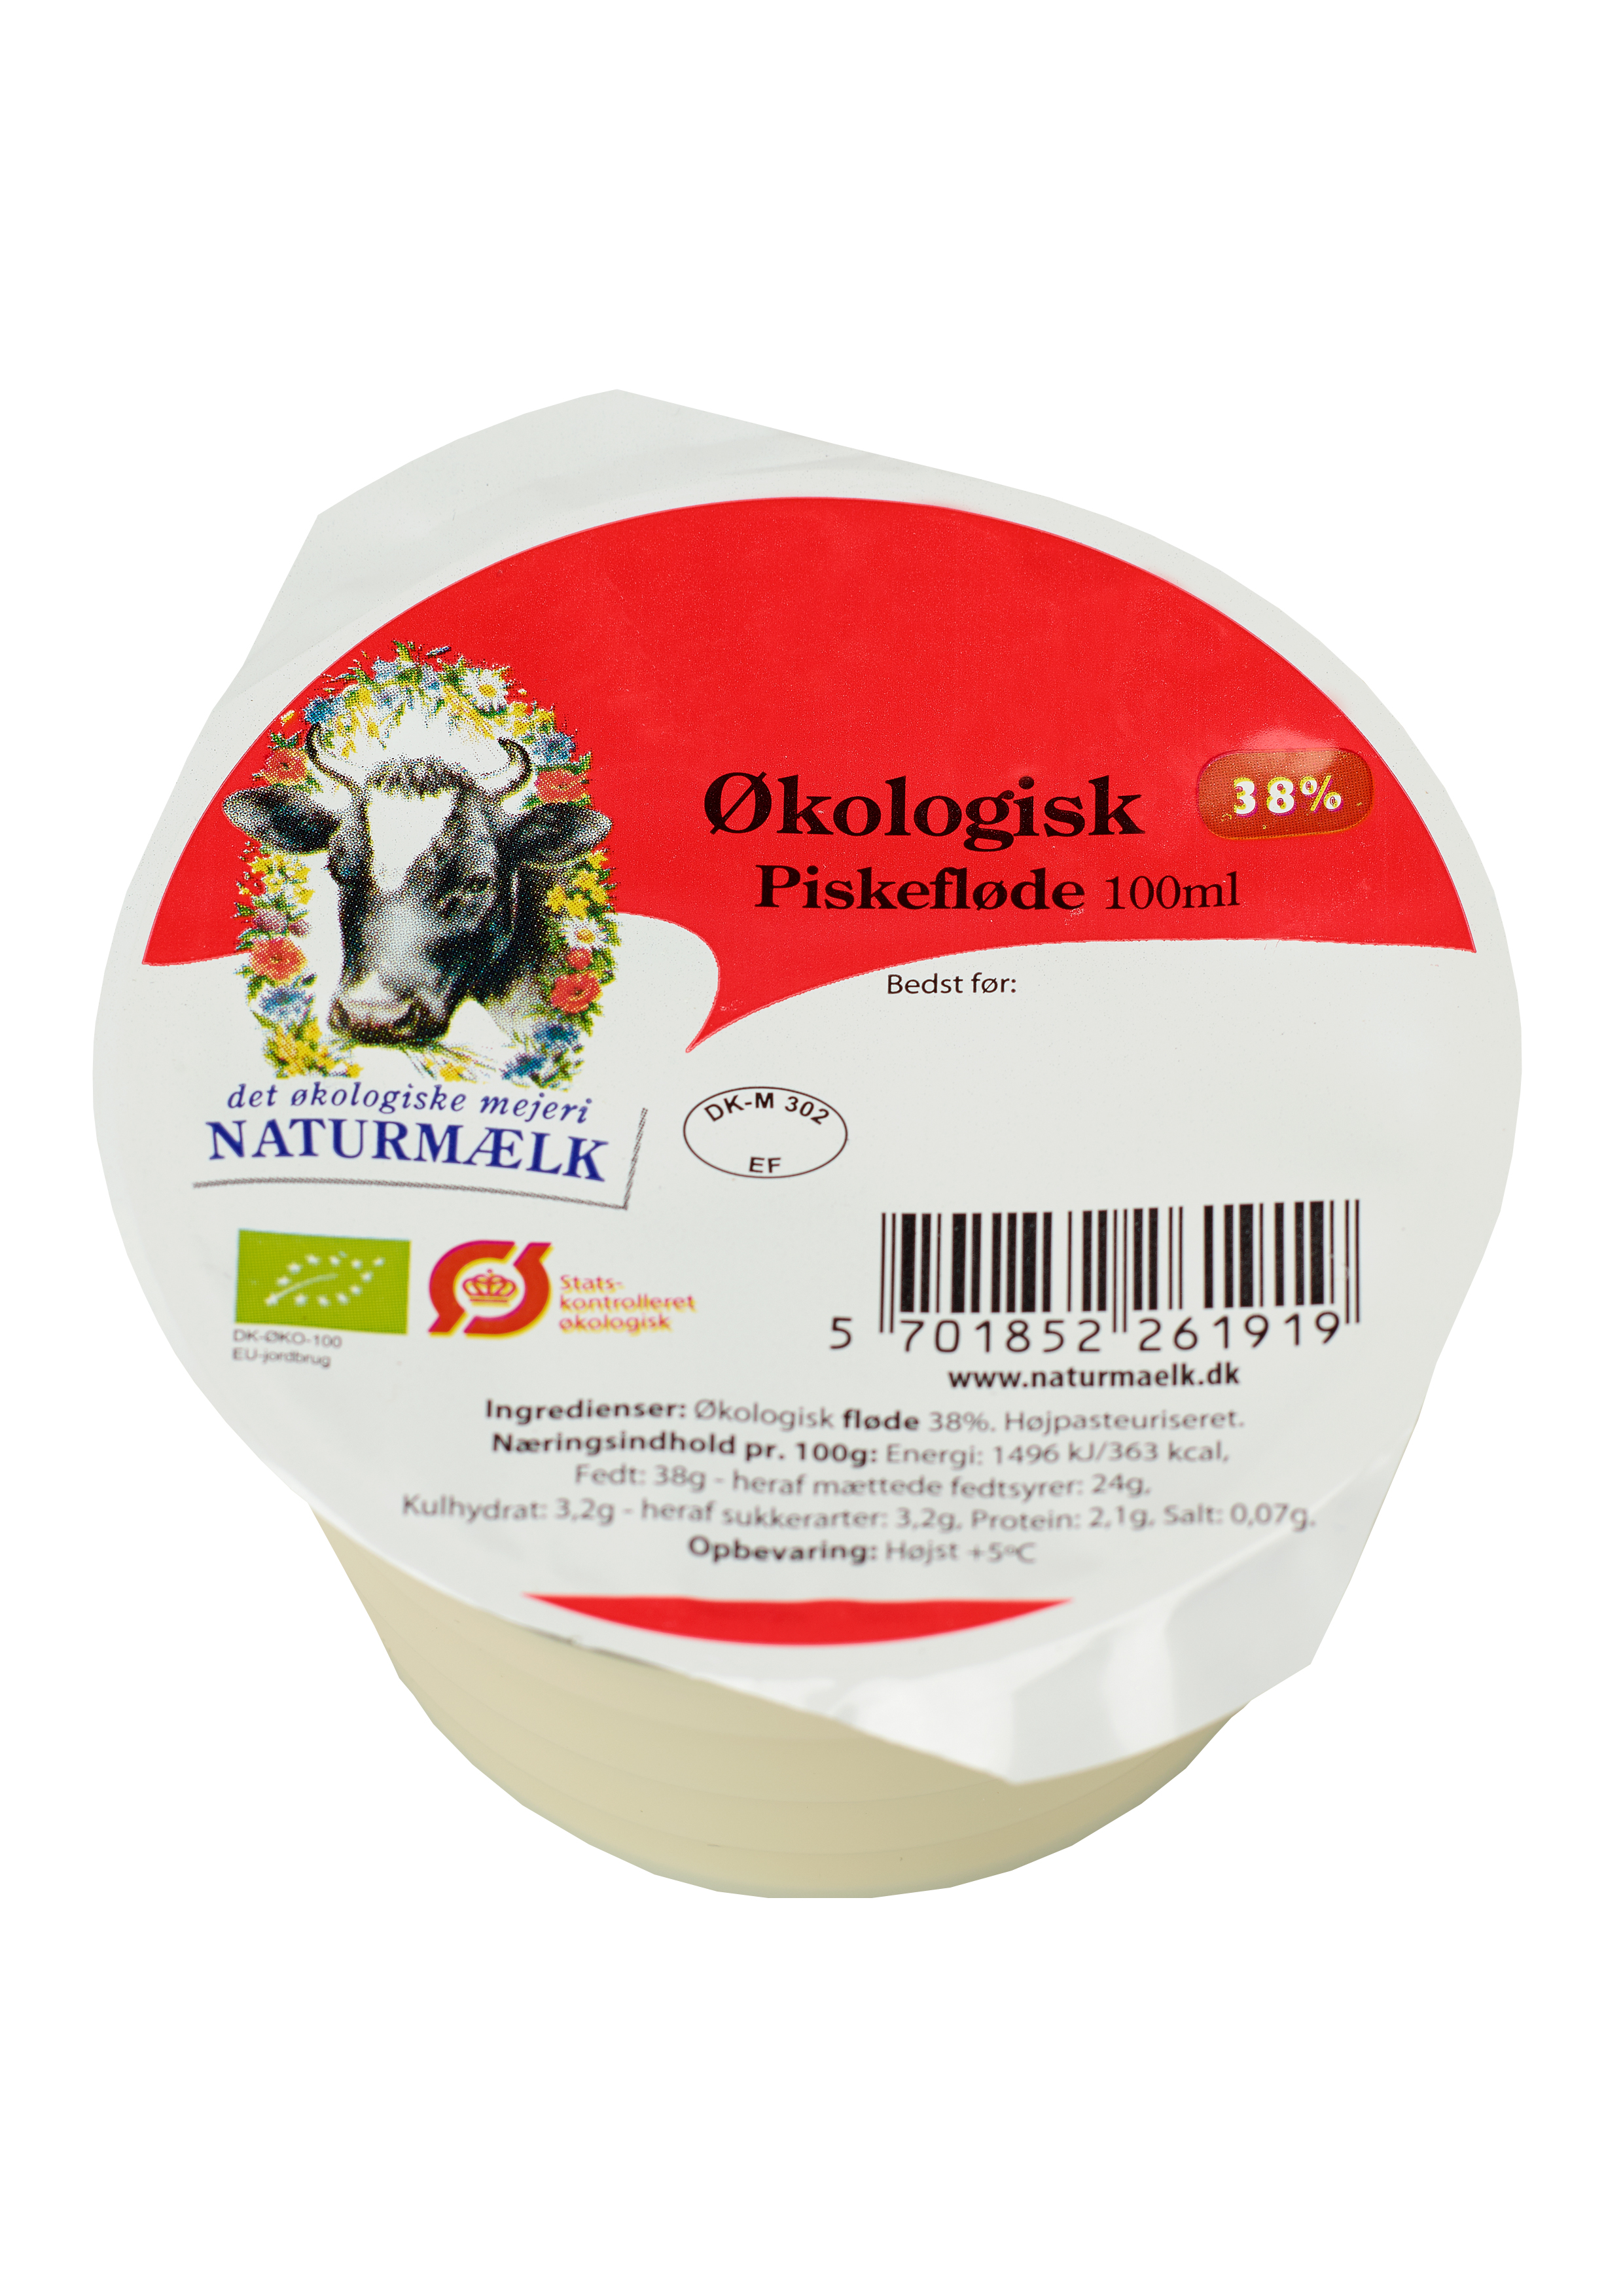 Dejlig Økologisk Piskefløde 38% 100ml - naturmælk.dk IK-78